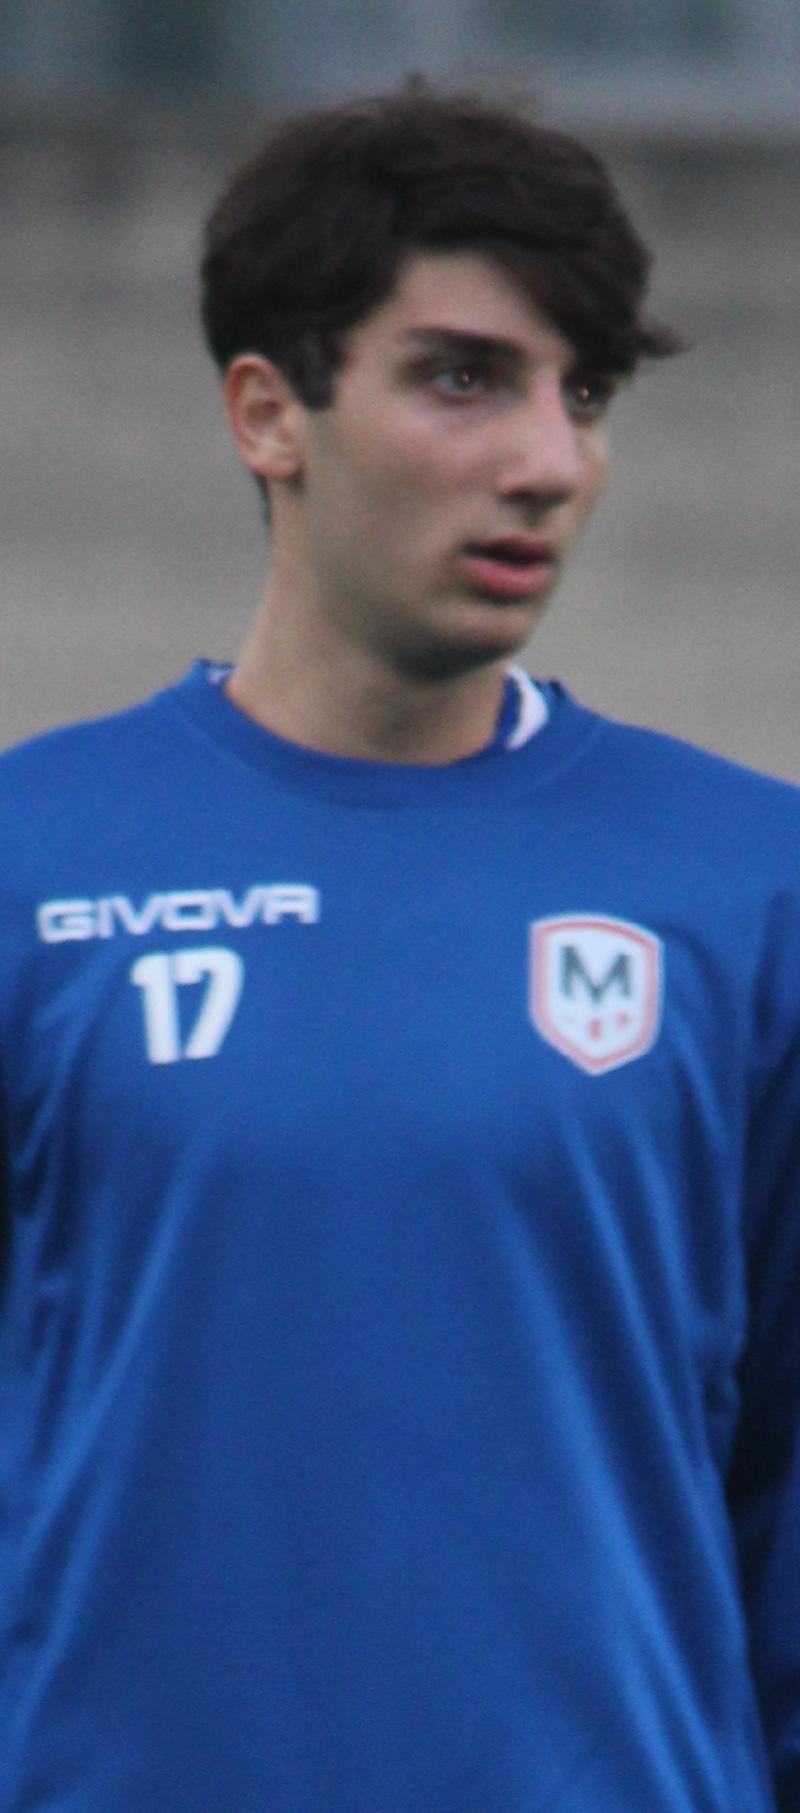 FRANCESCO MASSARELLI